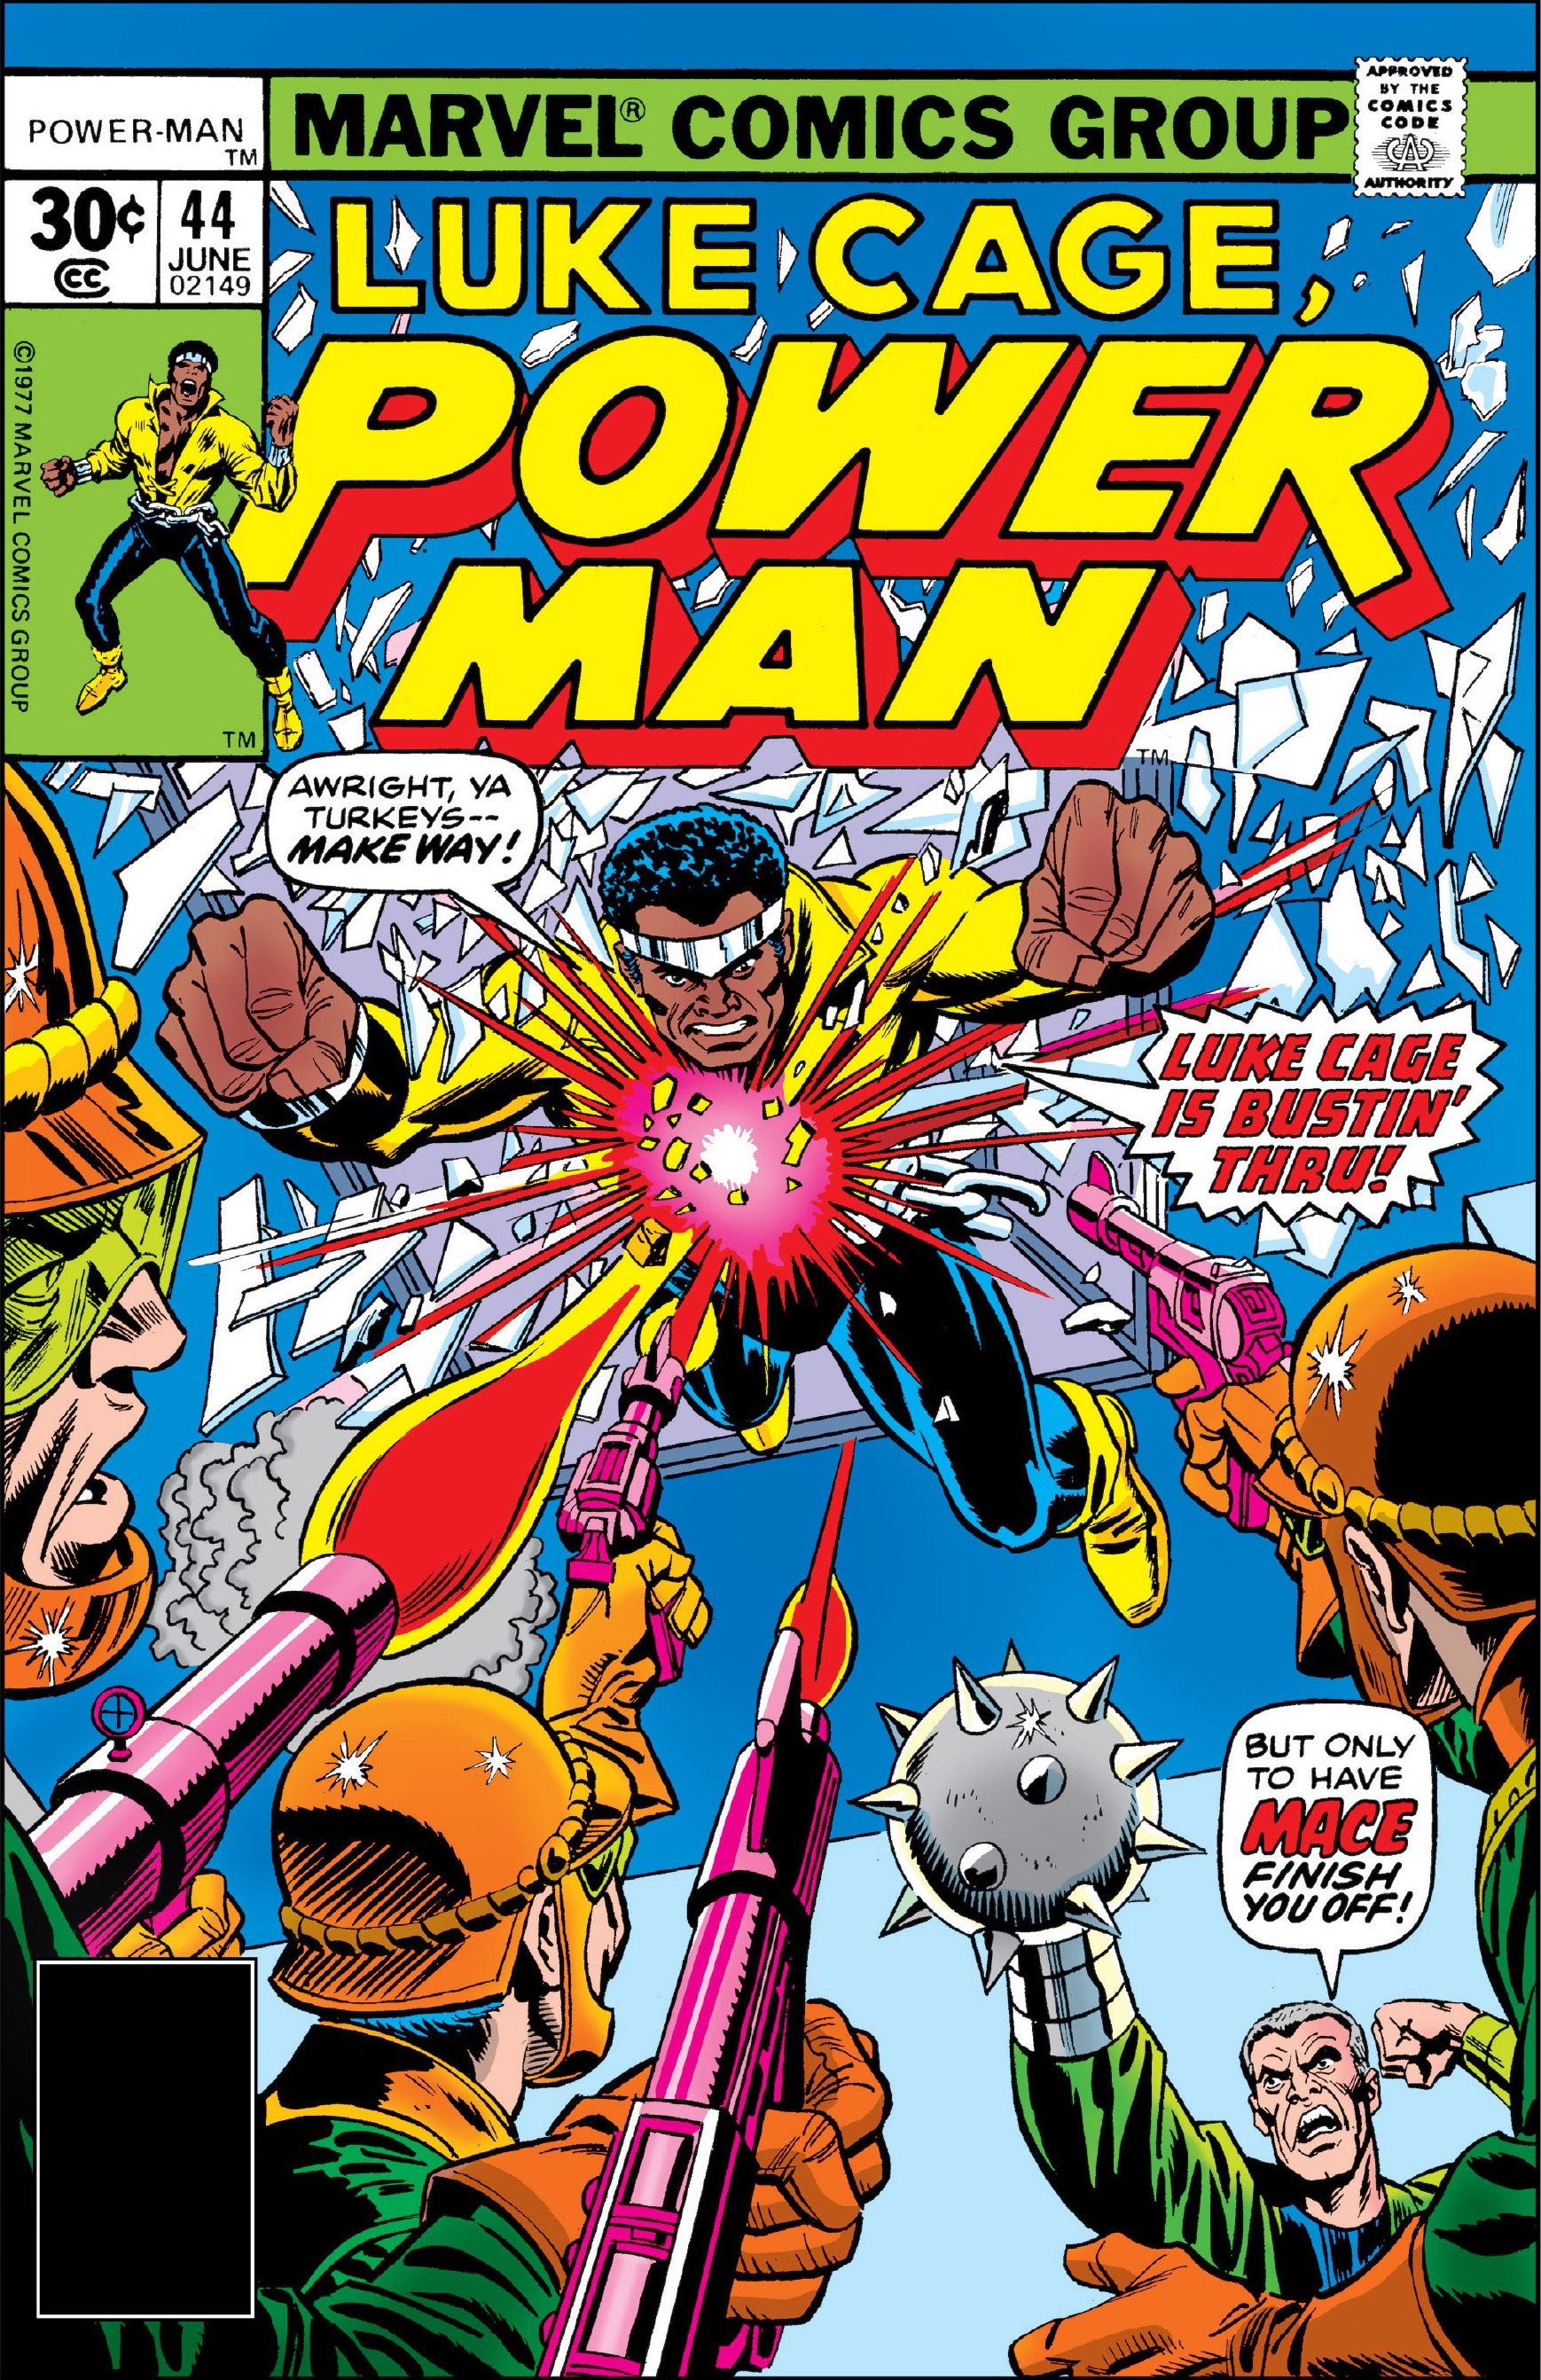 Power Man Vol 1 44